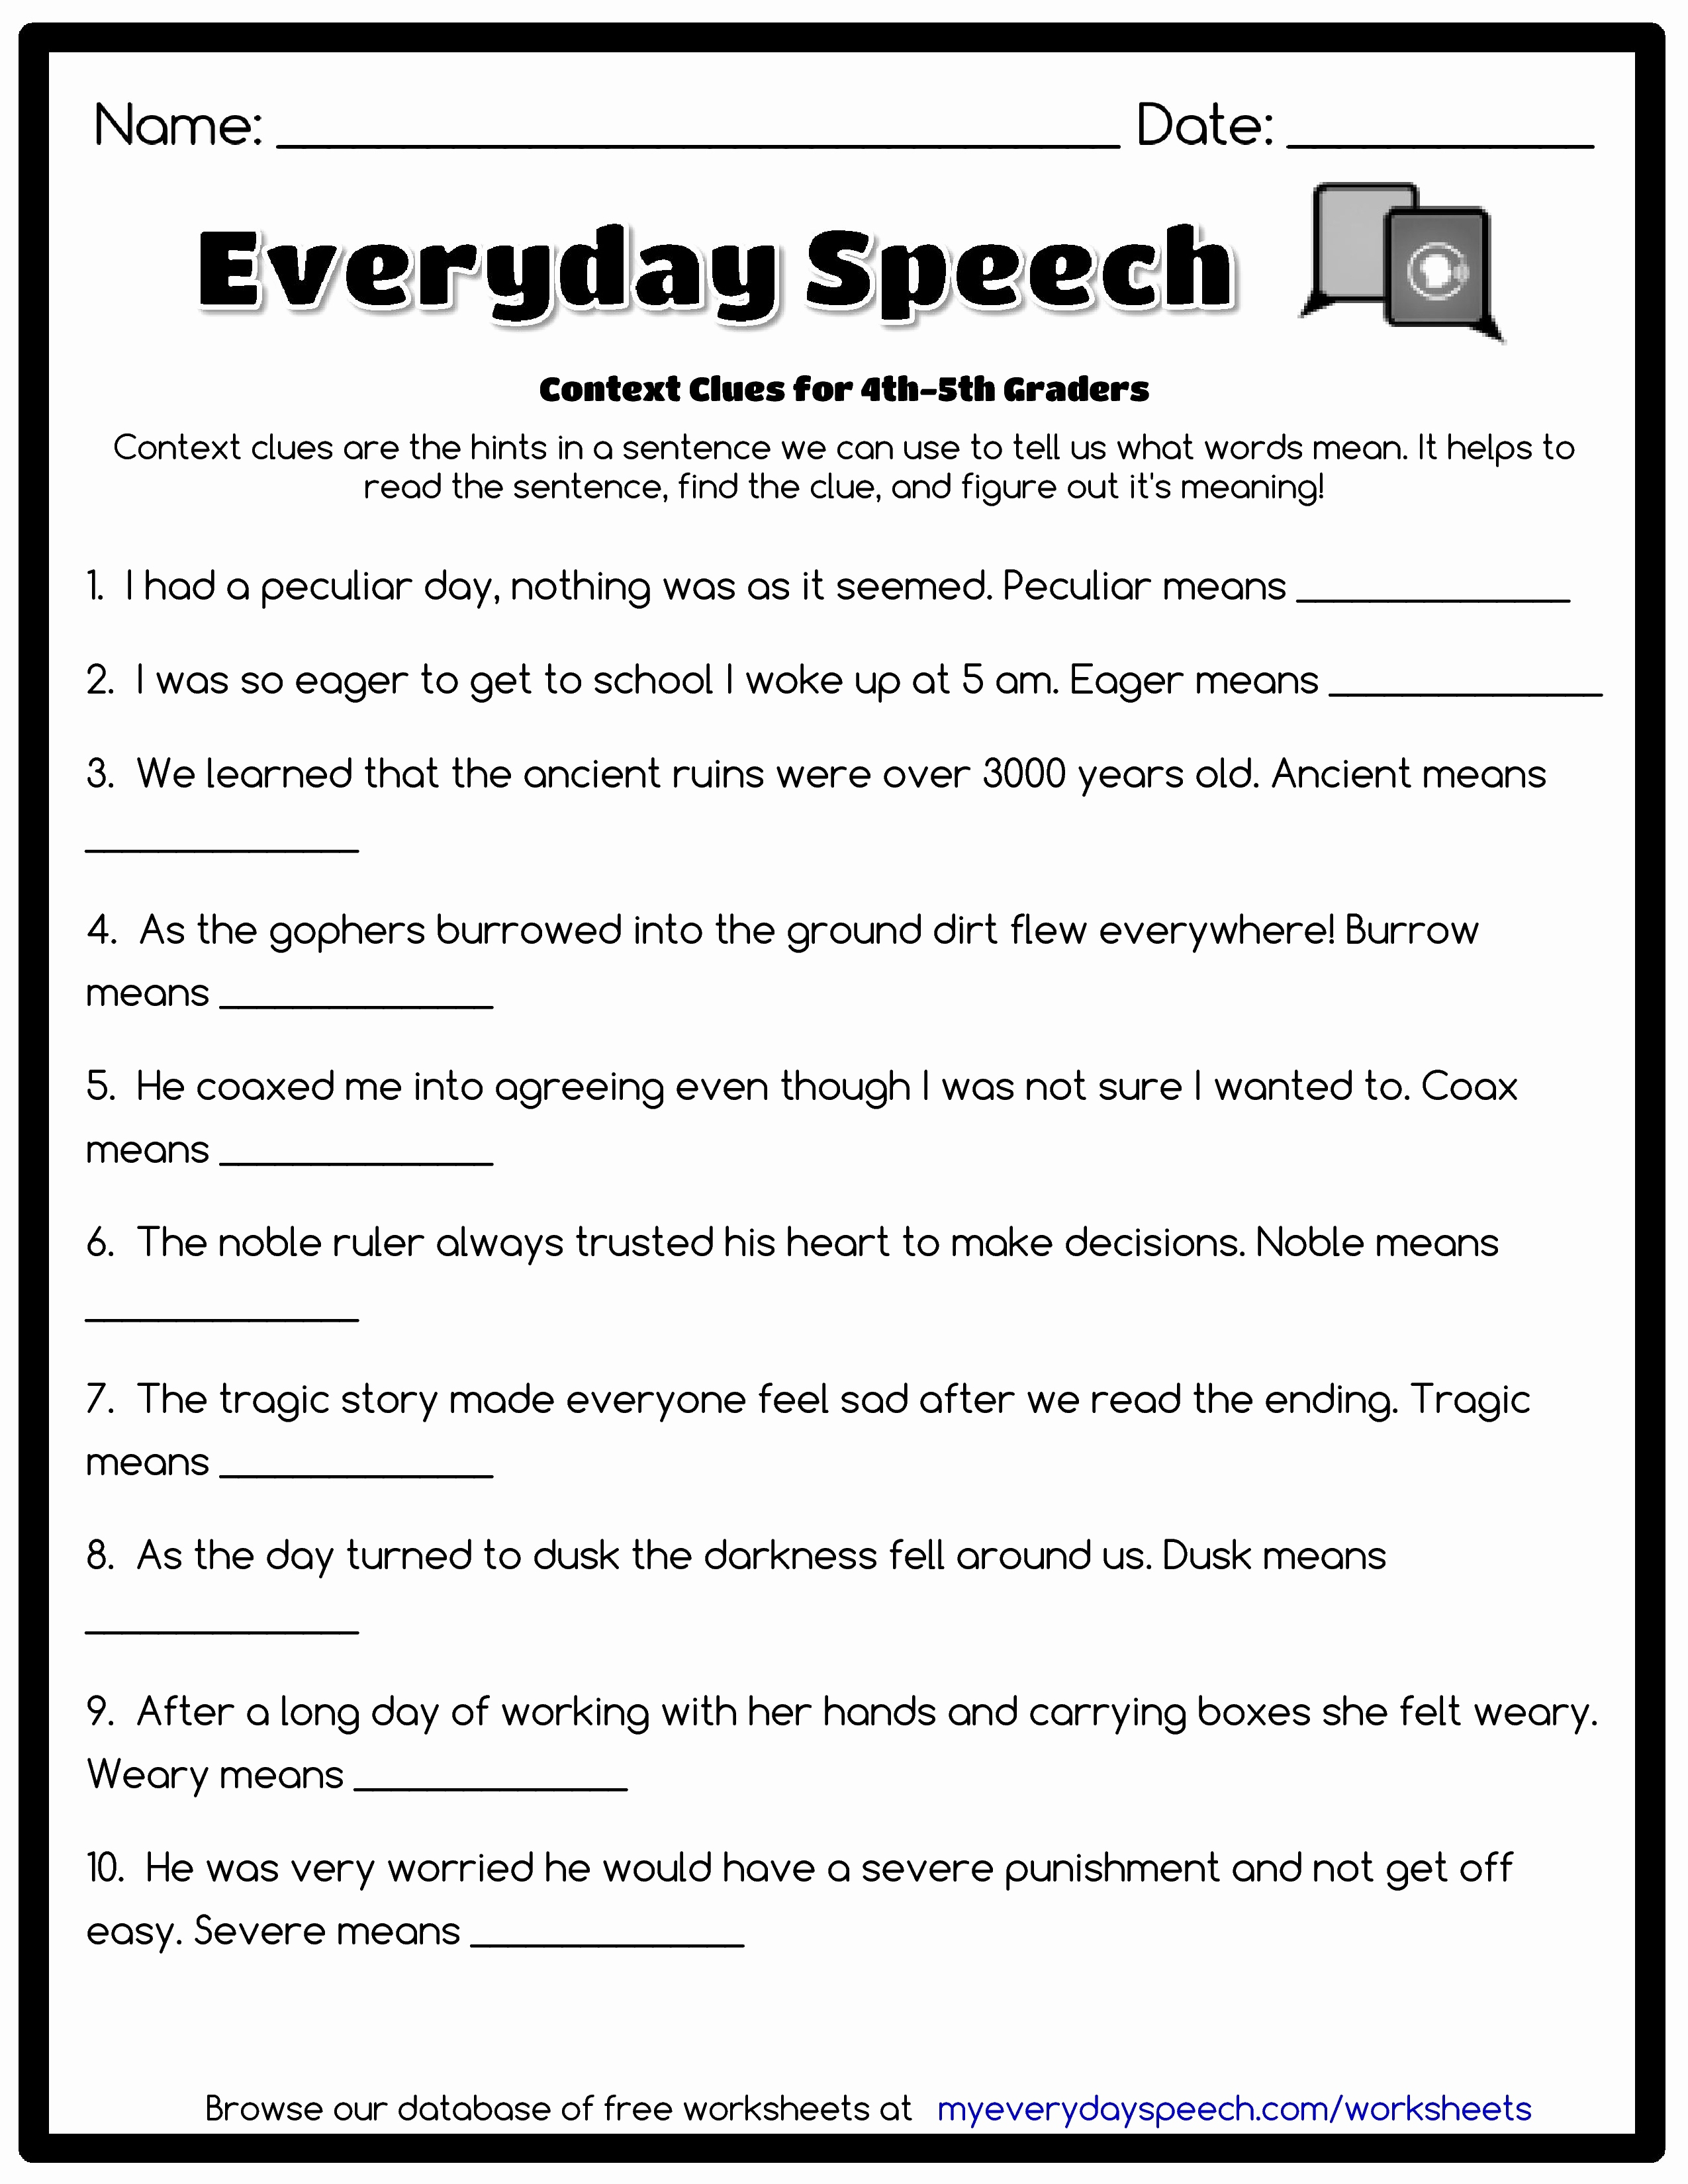 Grammar Worksheets Third Grade To Education - Math Worksheet For | 3Rd Grade Grammar Free Printable Worksheets